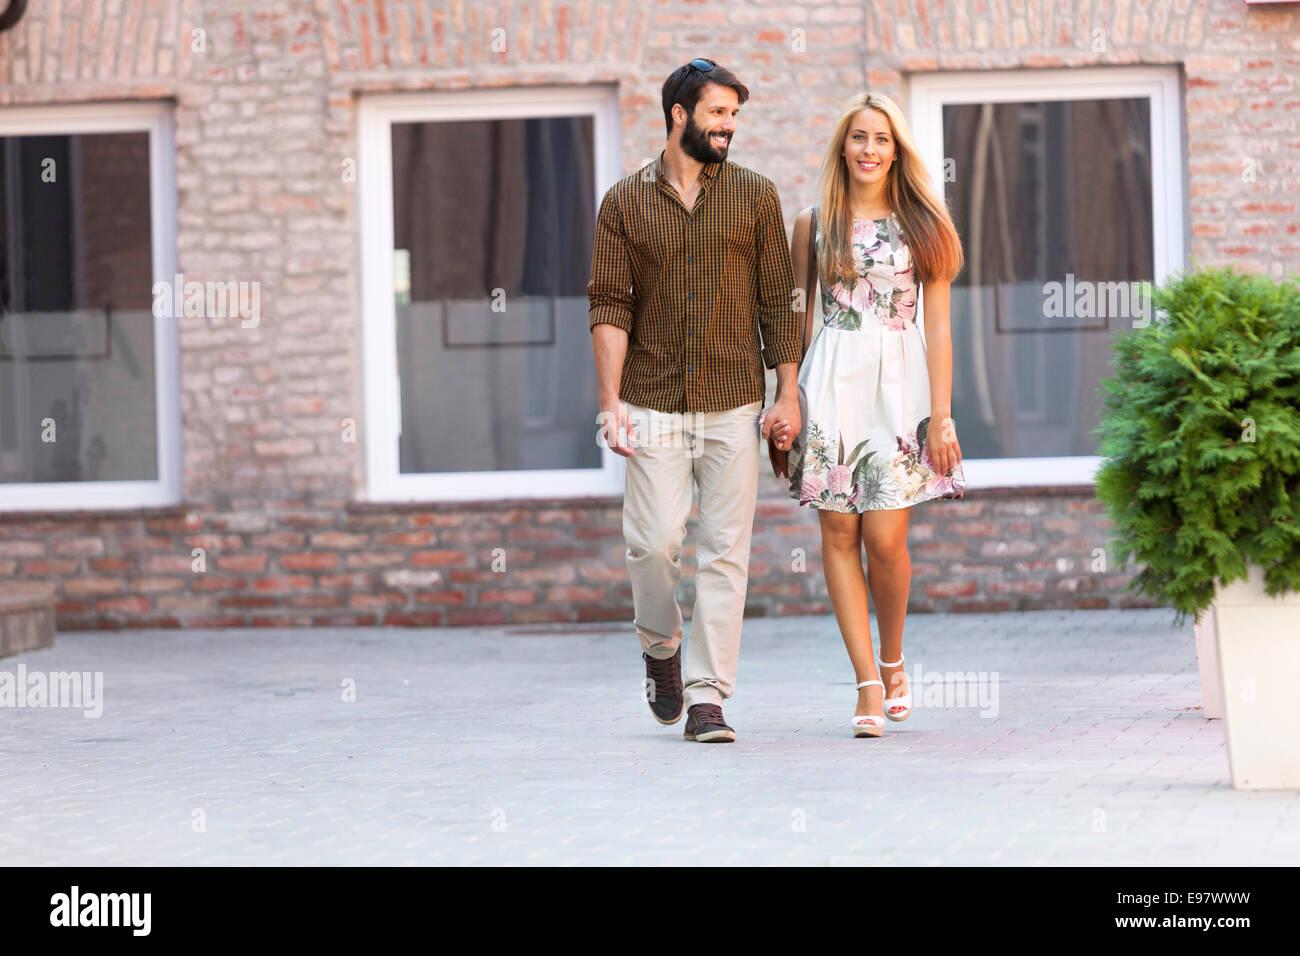 Happy young couple holding hands fait une promenade Photo Stock